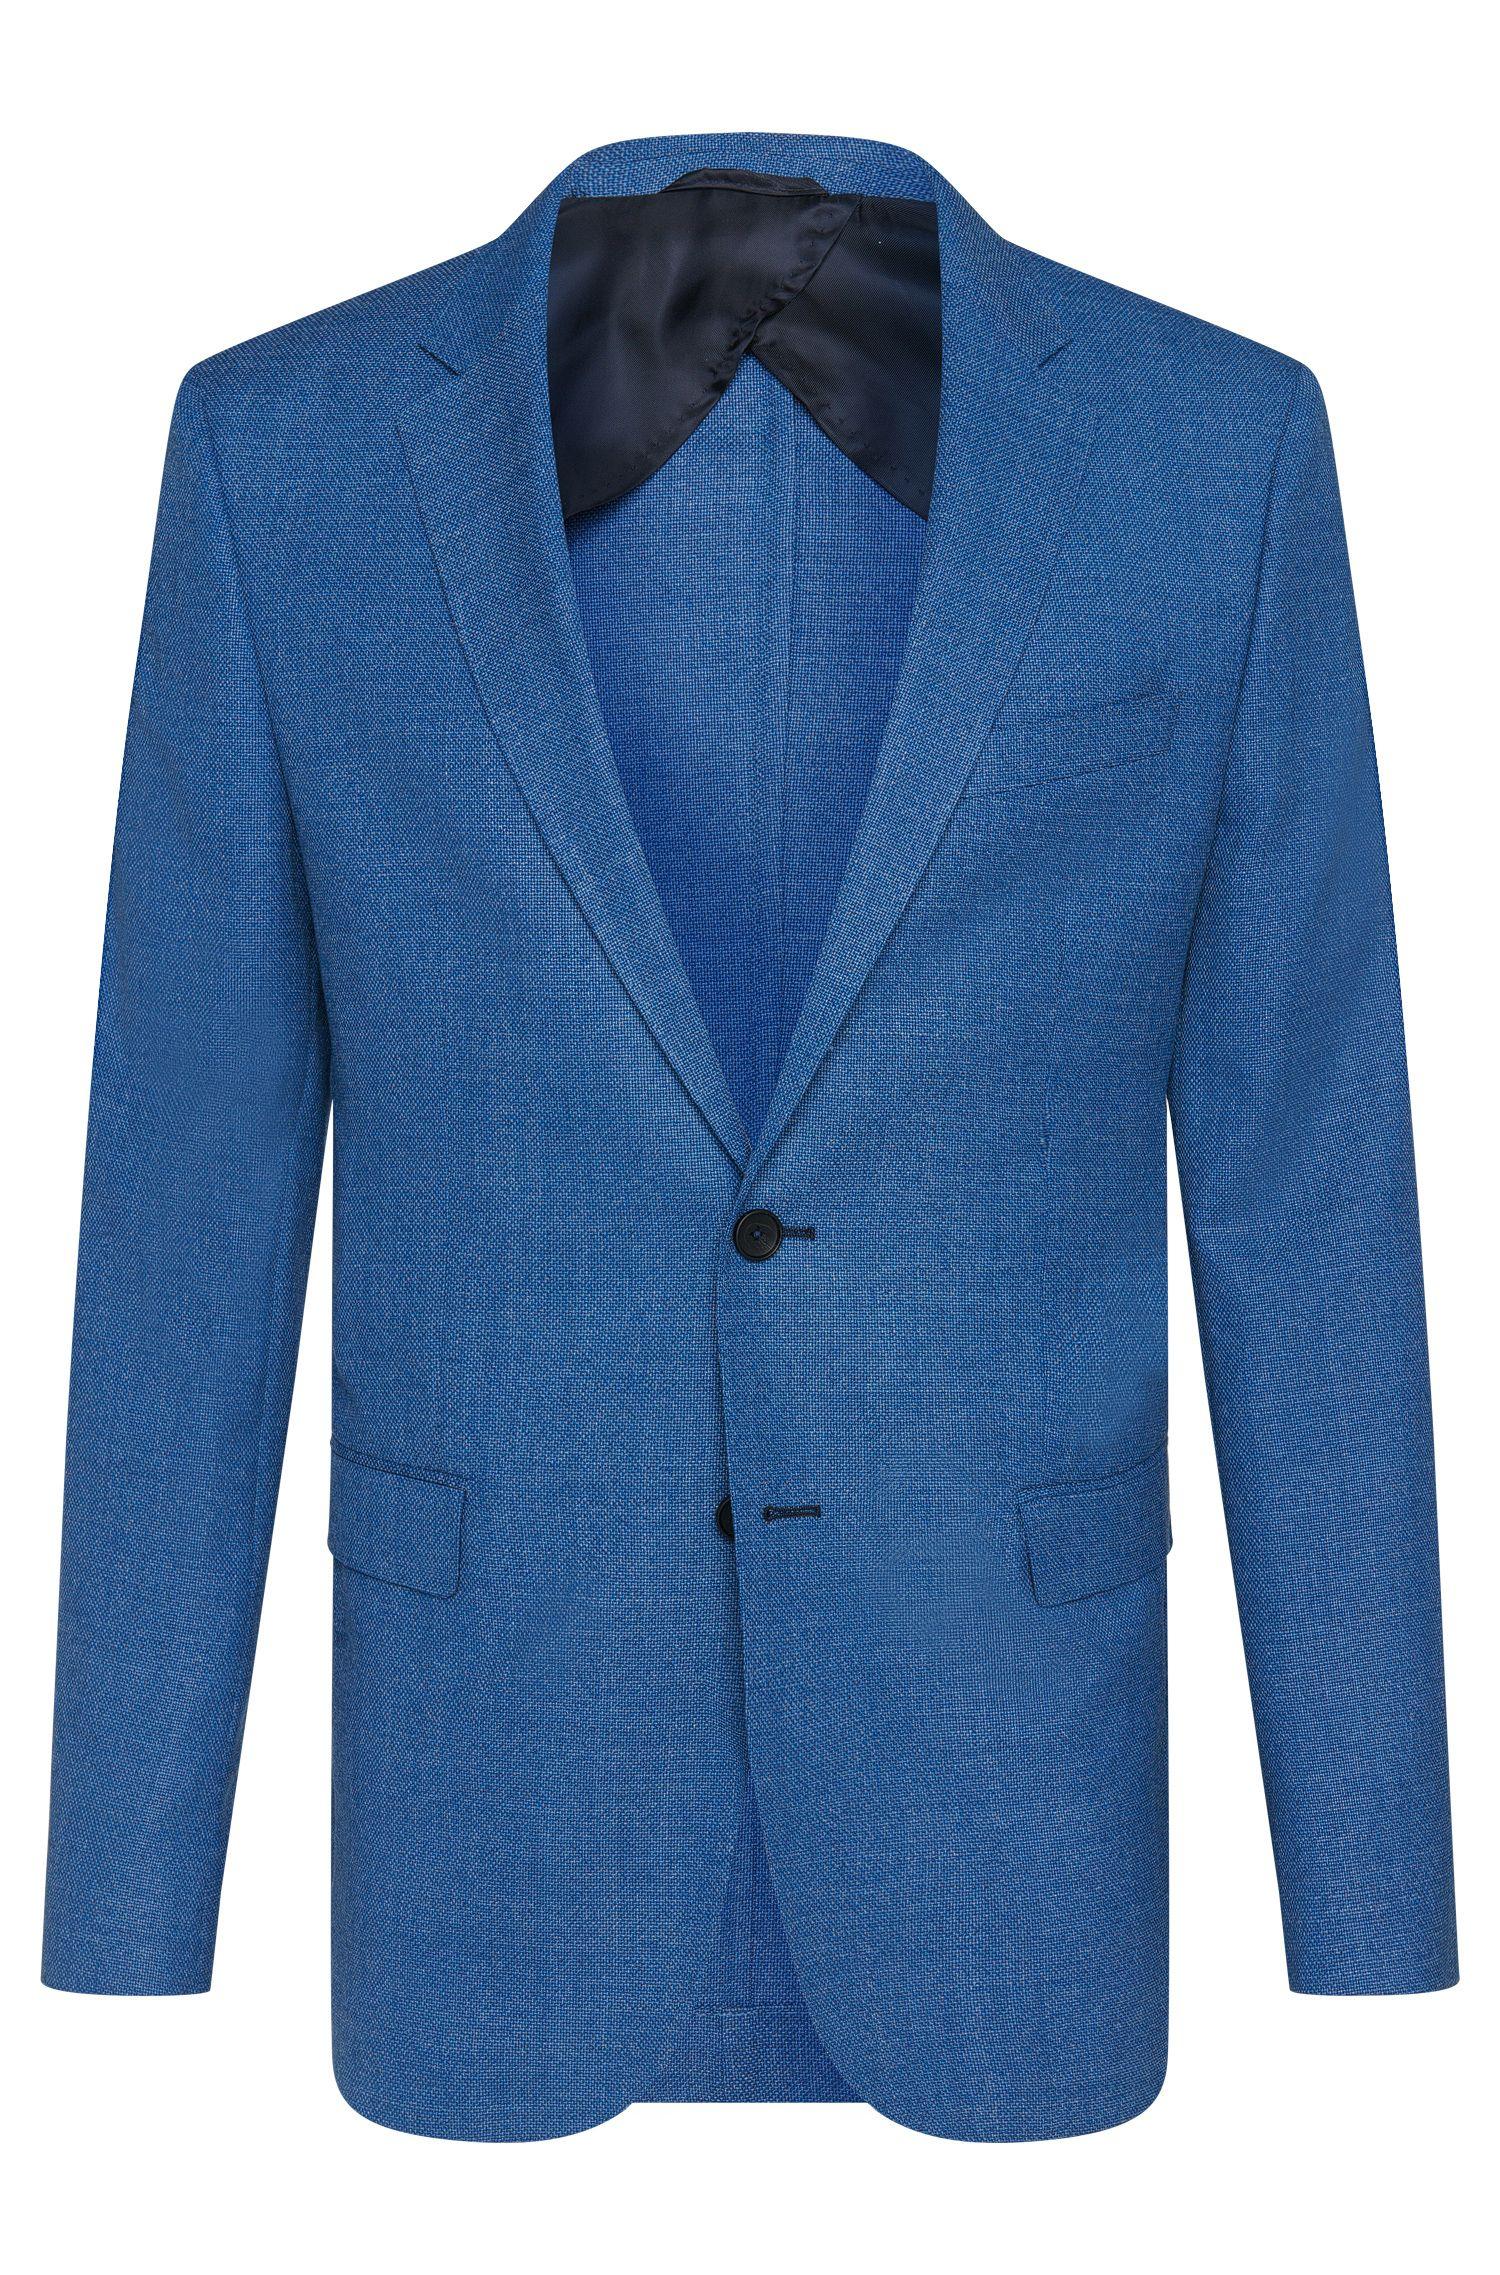 'Nobis' | Slim Fit, Super 110 Italian Virgin Wool Sport Coat